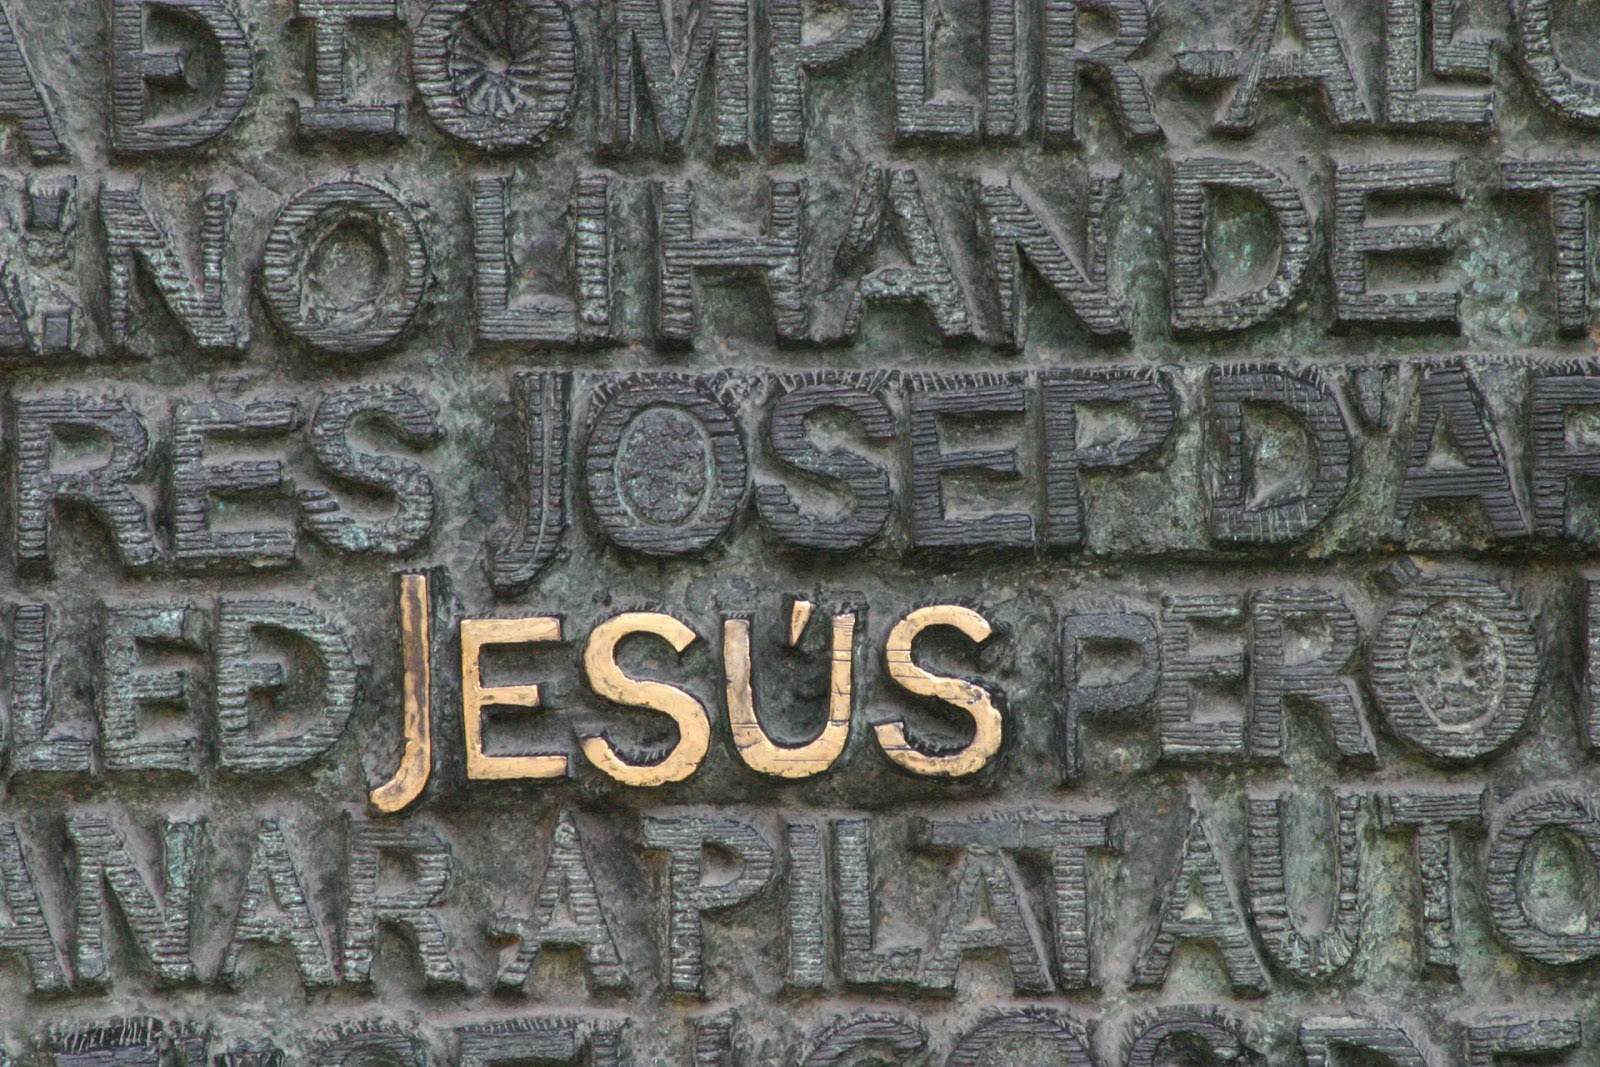 Engraved name of Jesus